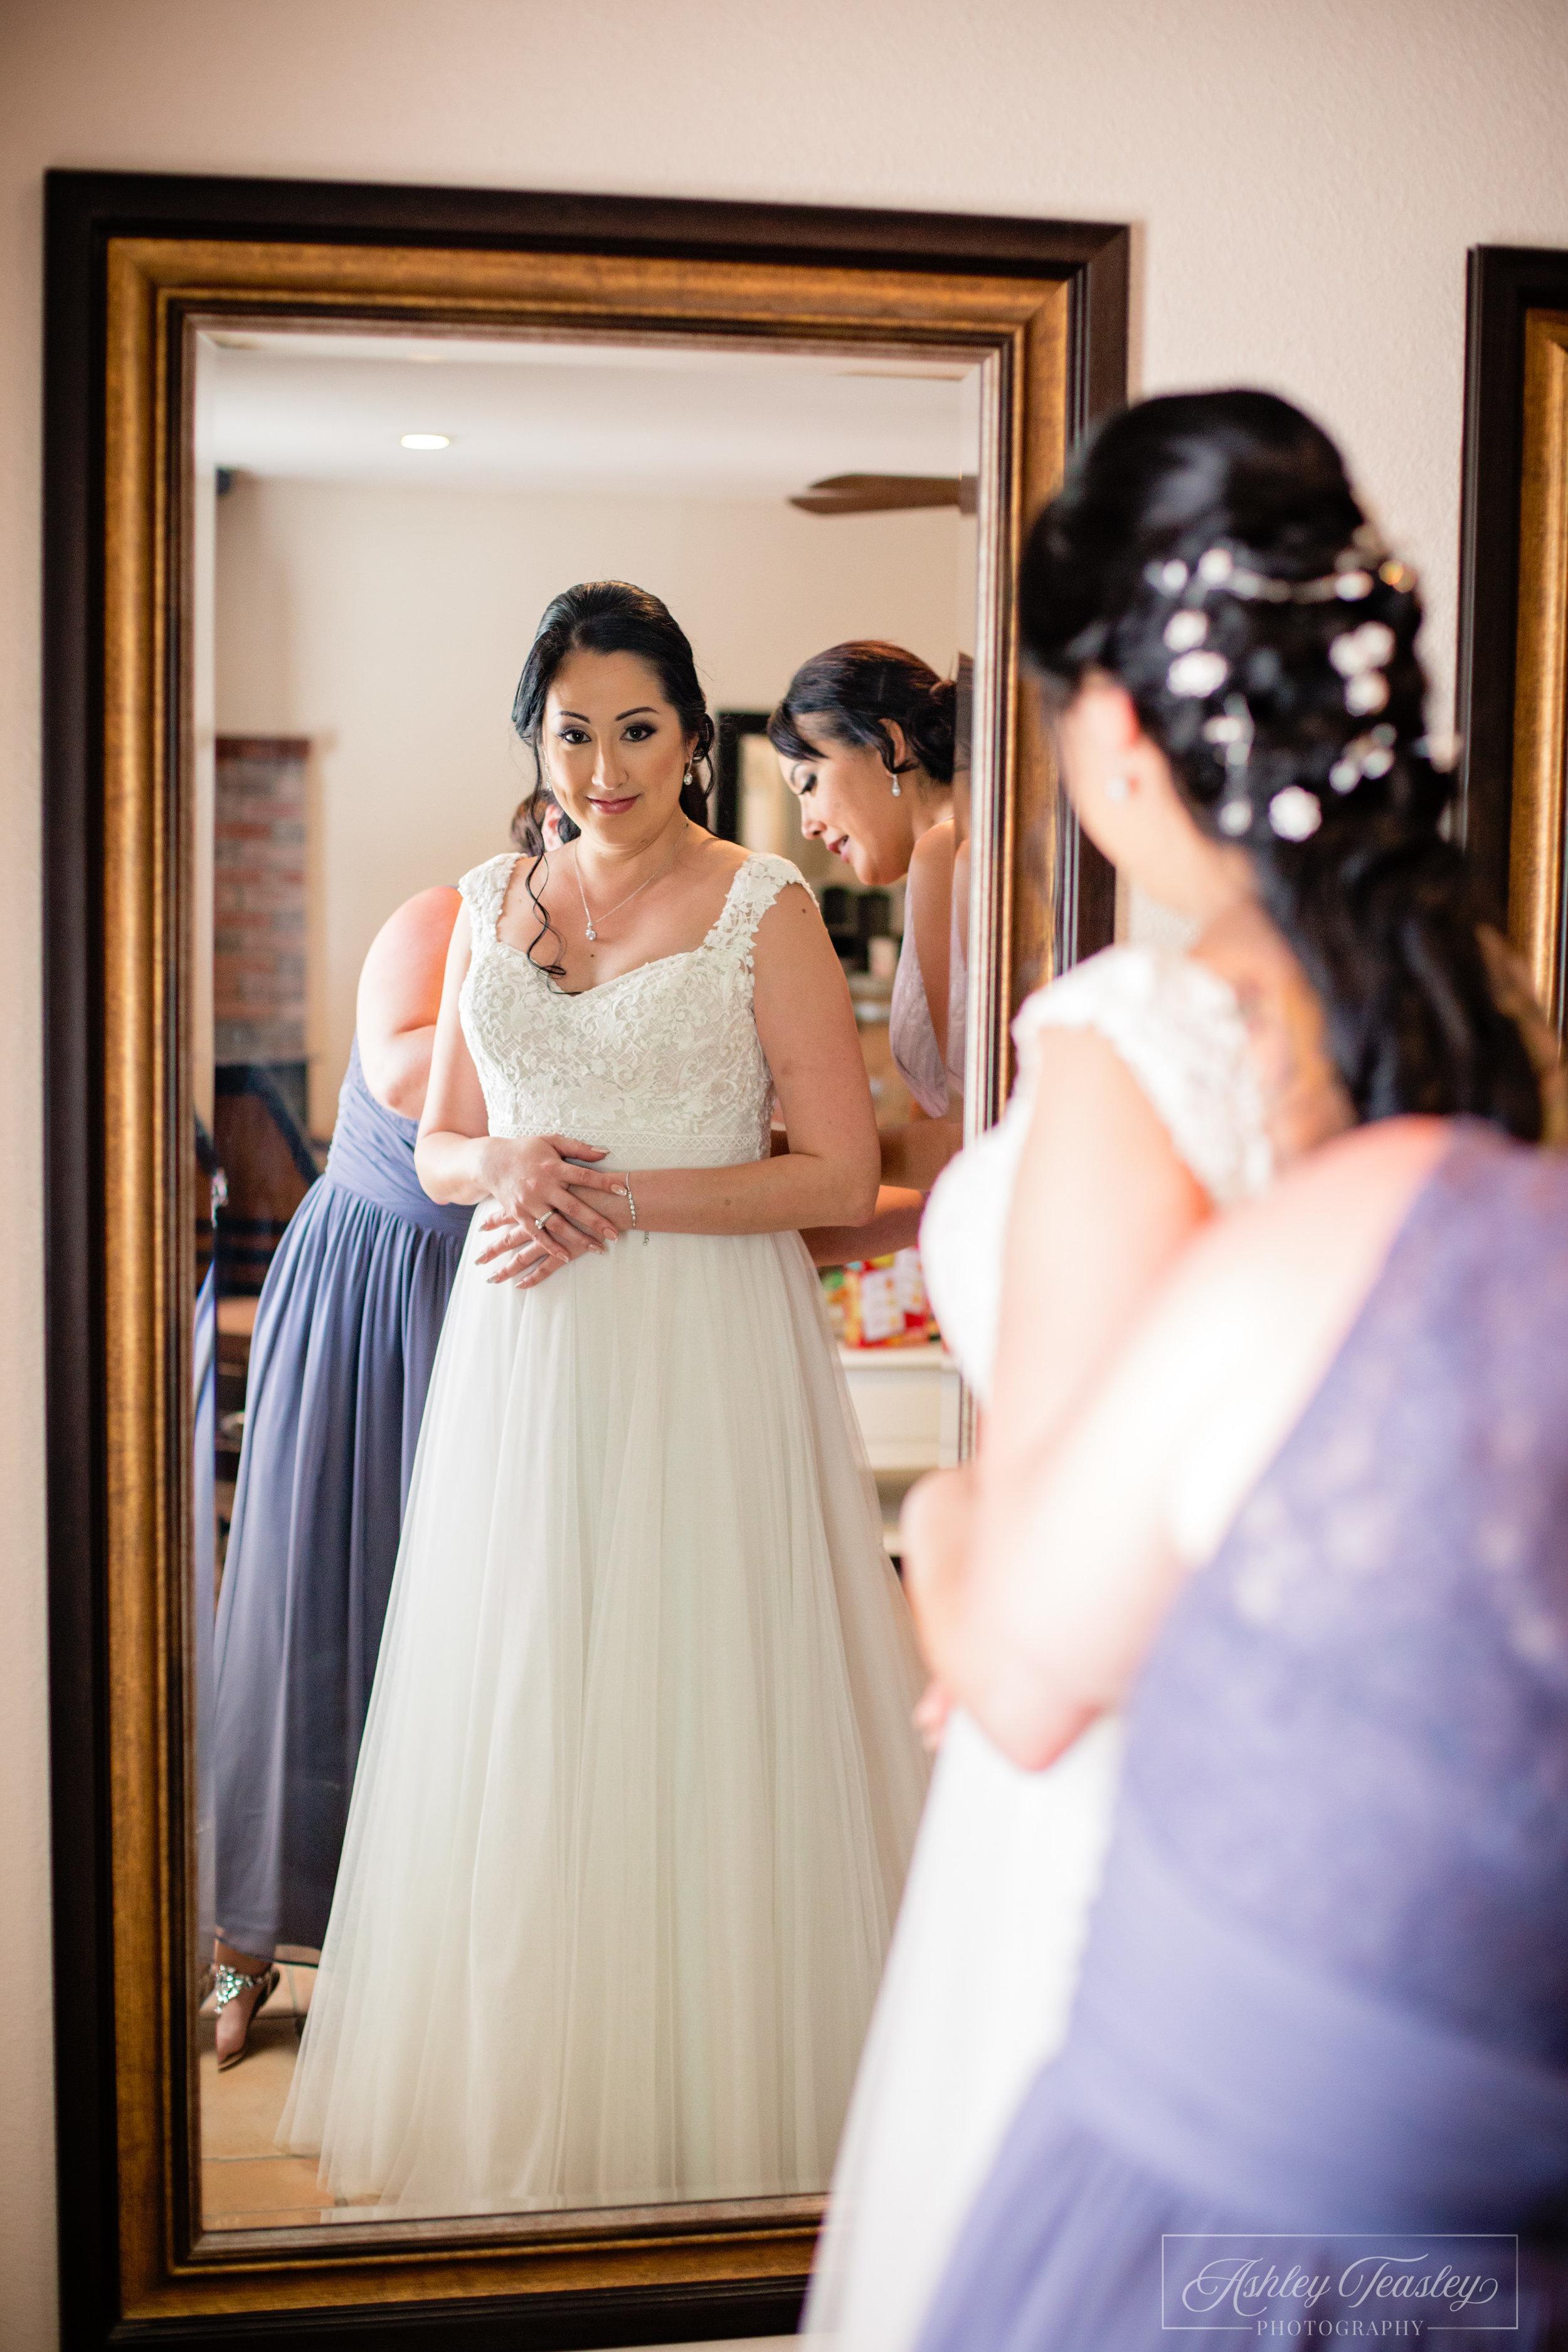 Jeanette & Rance - Butte Star Ranch - Sacramento Wedding Photographer - Ashley Teasley Photography (38 of 41).jpg